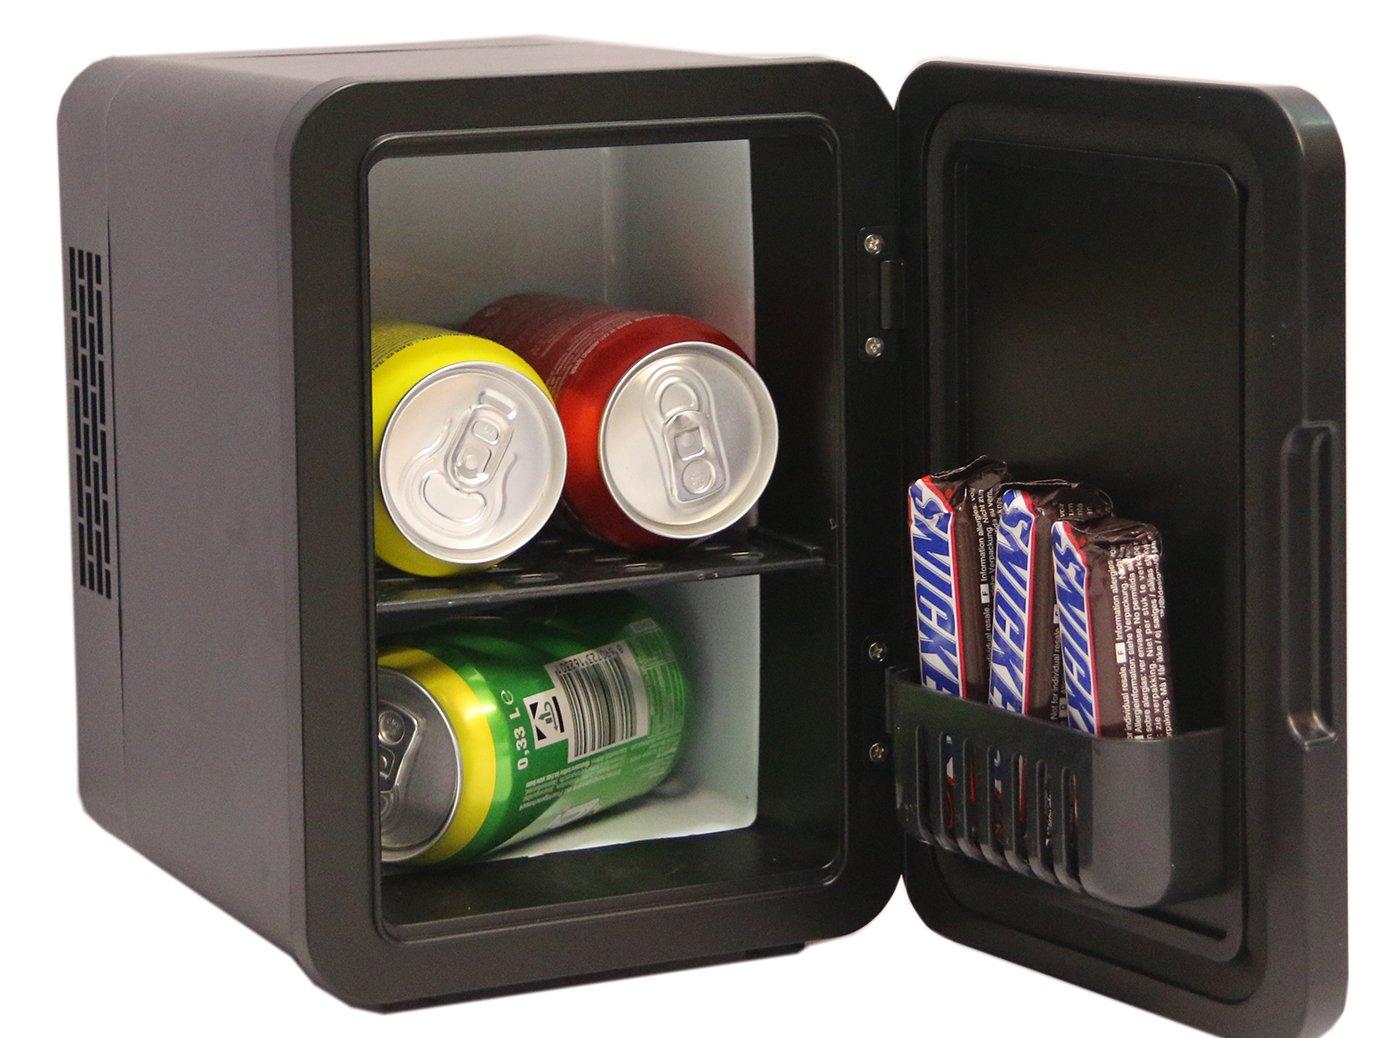 Mini Kühlschrank Mit Gefrierfach 48 L A Gefrierschrank Kühlbox Kühler Hotel : Dms mini kühlschrank minibar kühlbox thermobox kühltruhe v